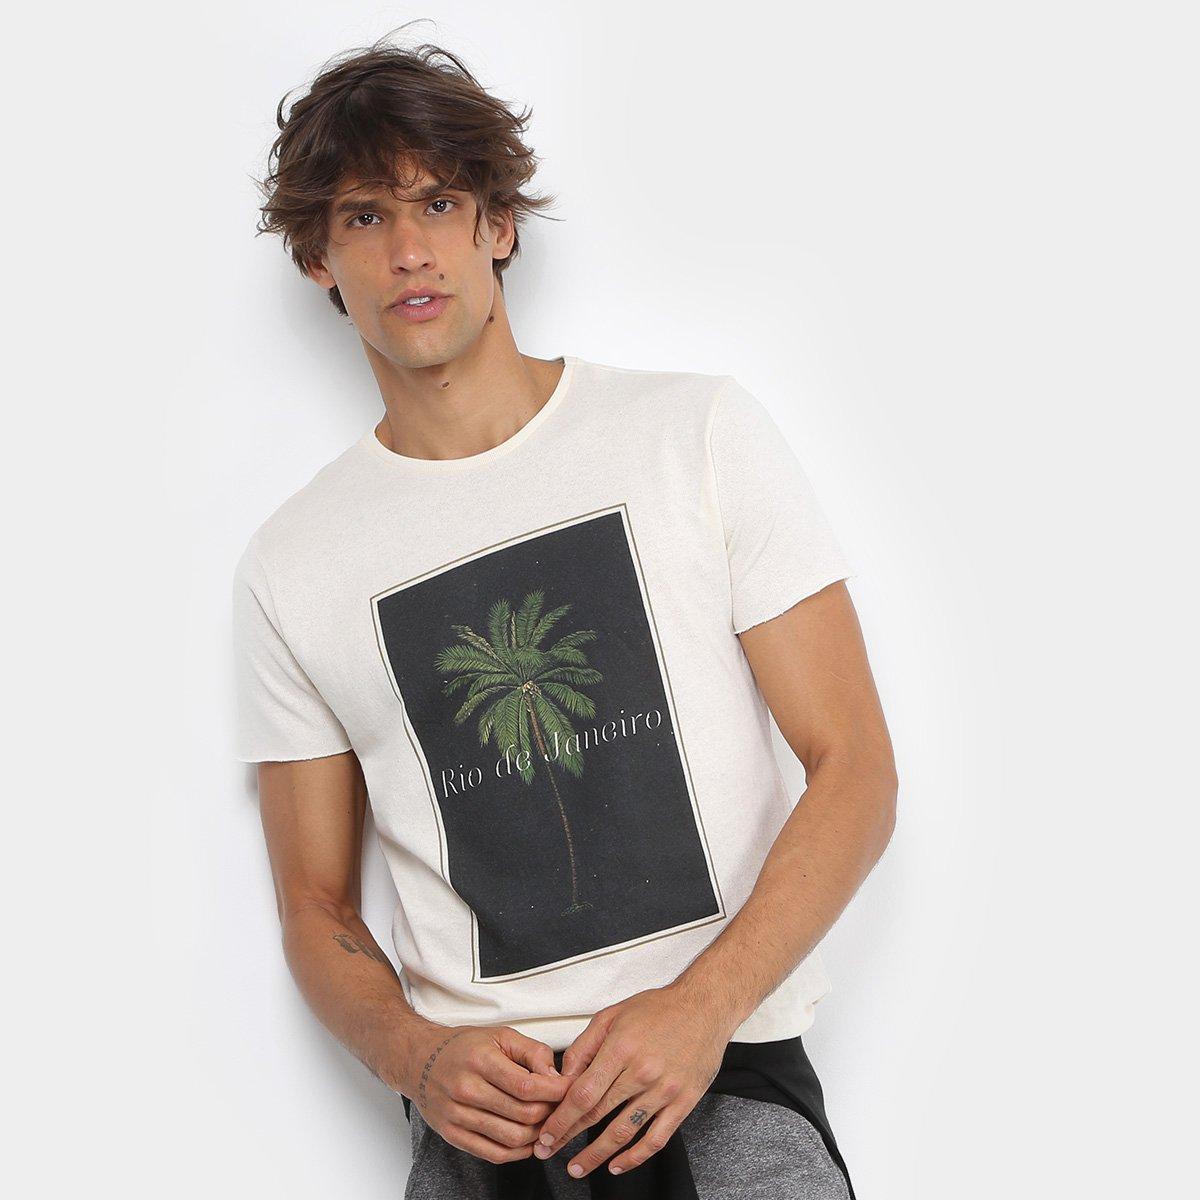 c11b09110 Camiseta Foxton Estampa Masculina